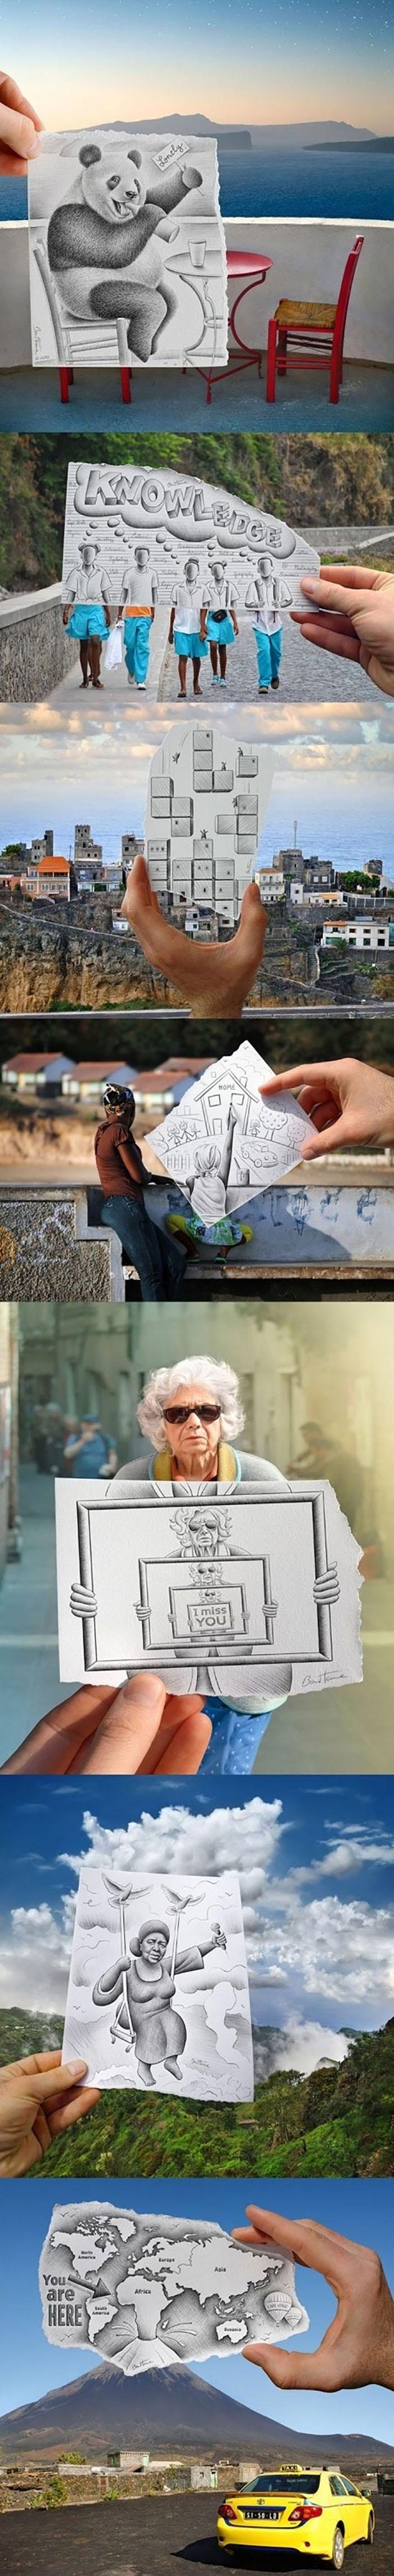 Reality meets art